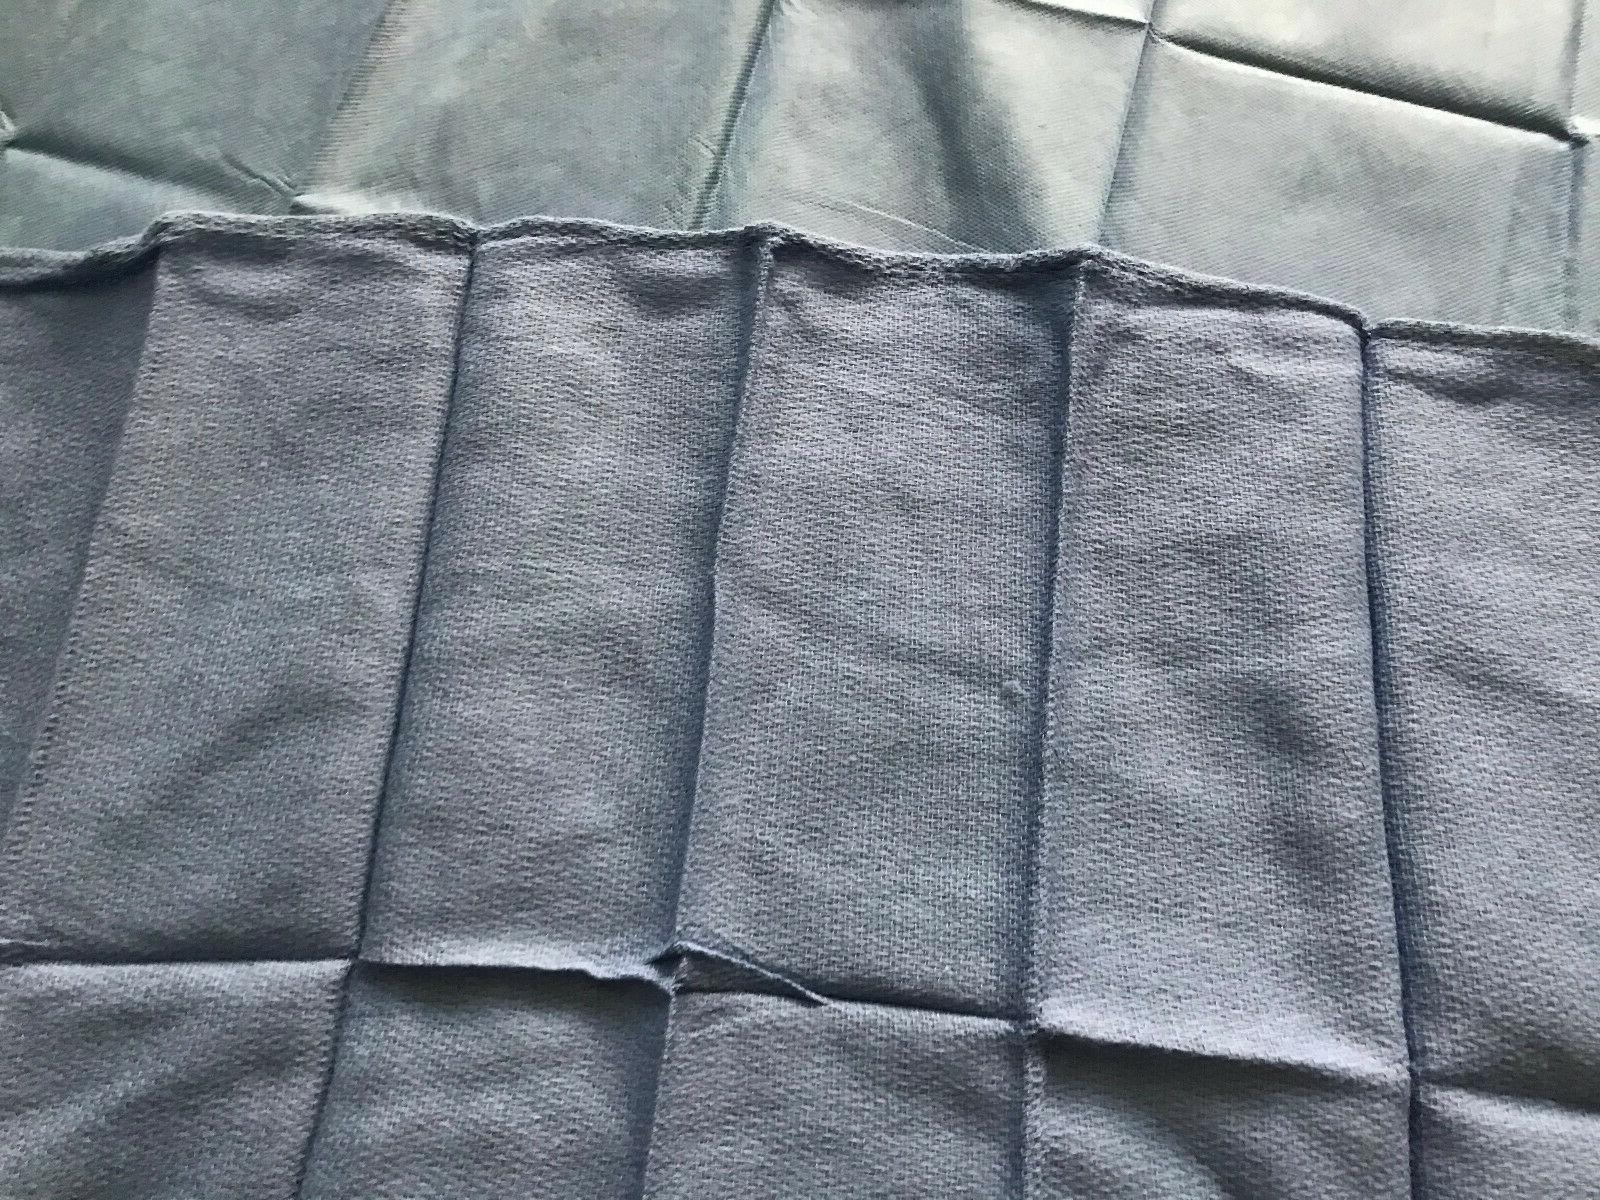 15PCS 100%Cotton towels Dish Drying 22.5' x